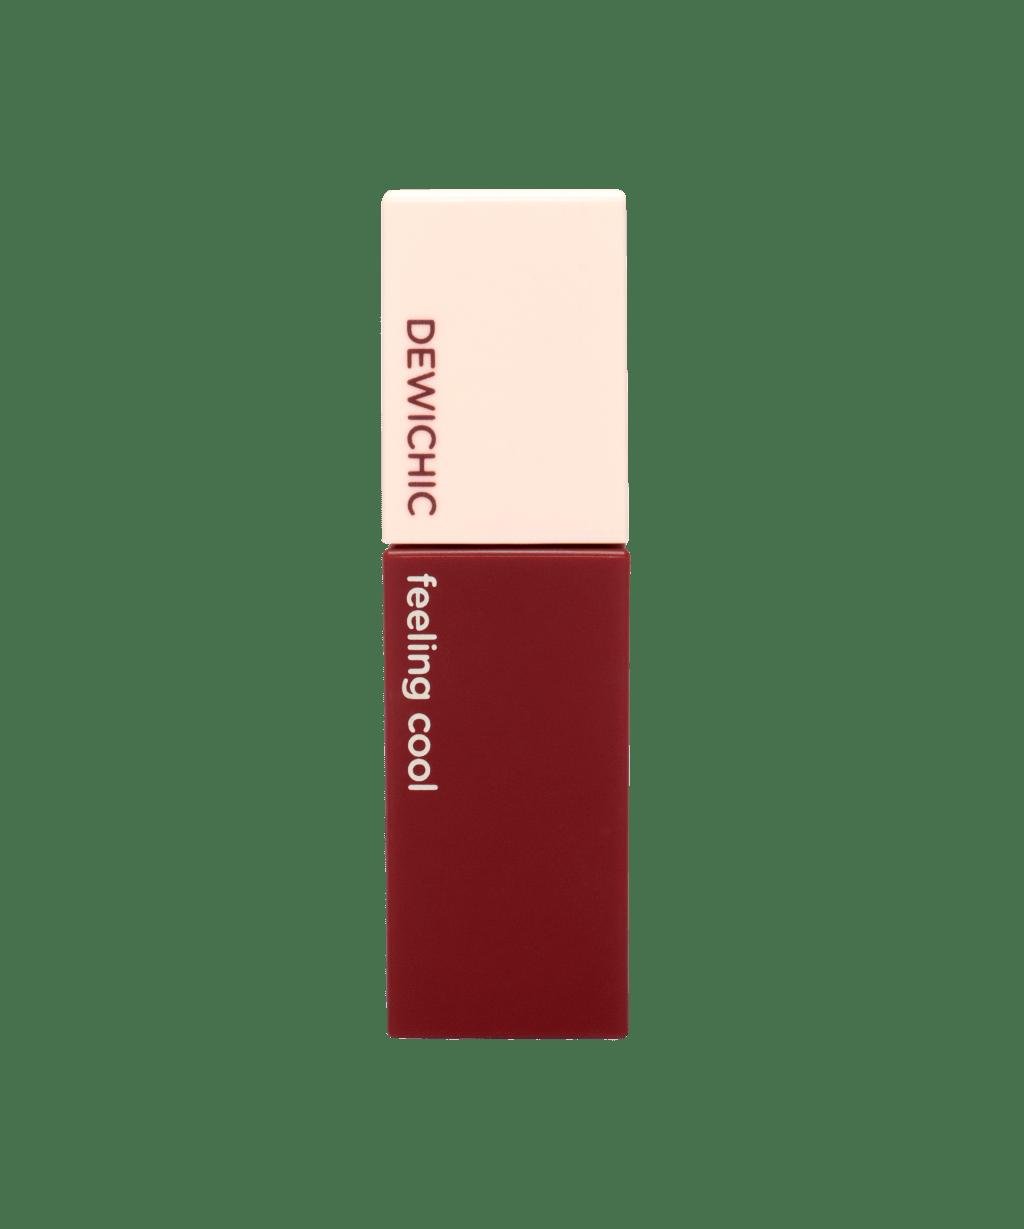 Lip Tint Mood Collection – Feeling Cool